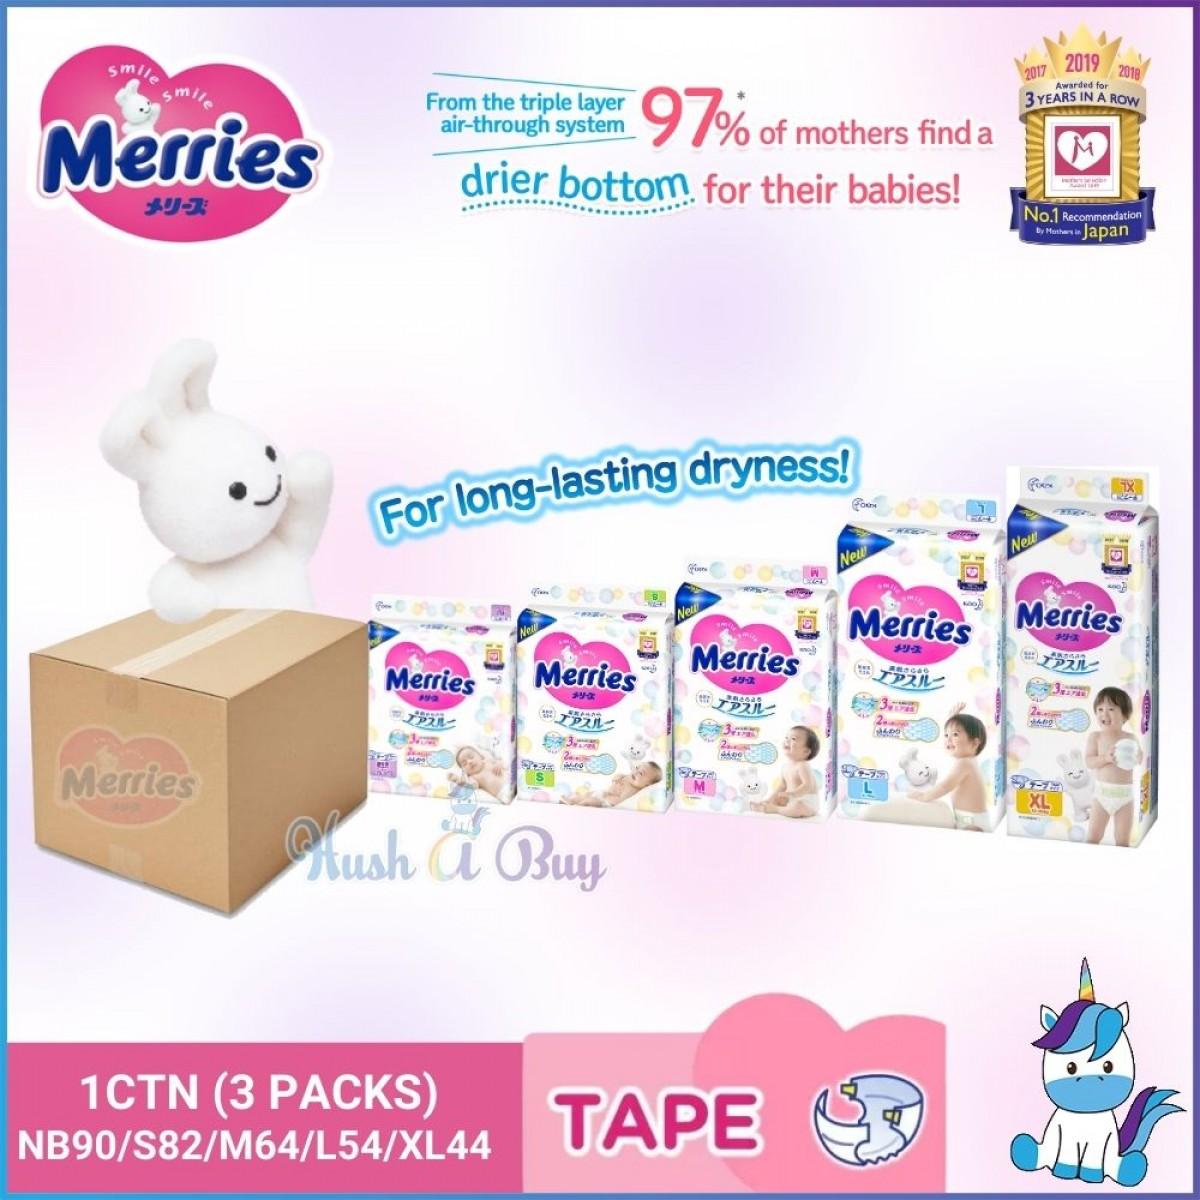 (1 CTN) Merries Super Premium Tape - NB90 / S82 / M64 / L54 / XL44 - Baby Diapers